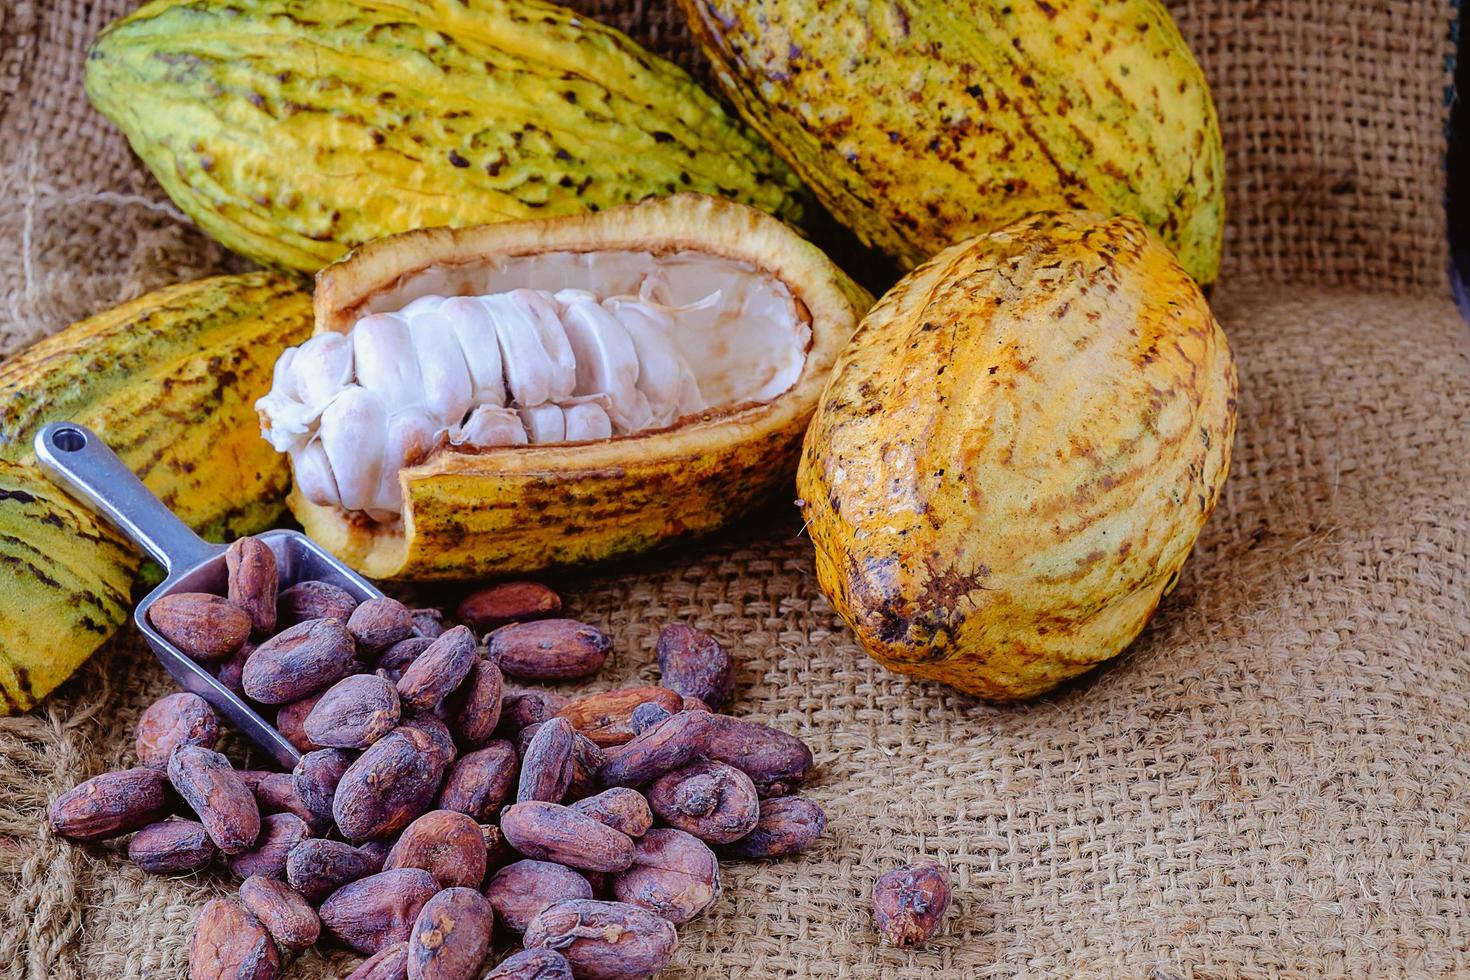 verse cacao met cacaopeulen en cacaobonen foto